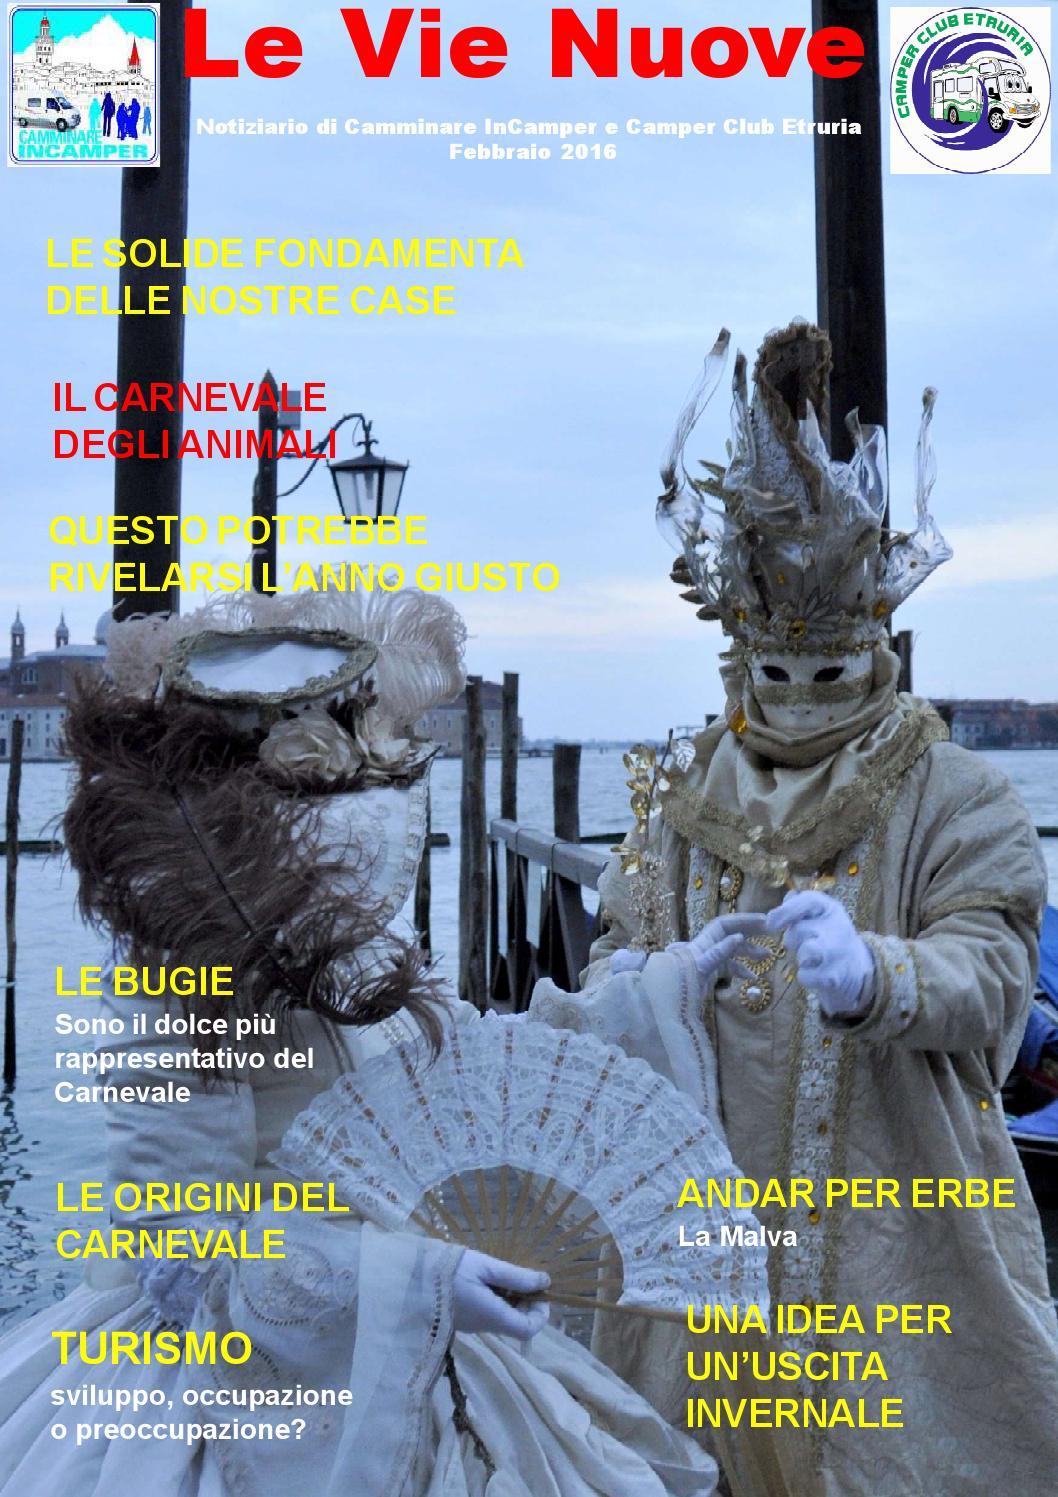 Le vie nuove febbraio 2016 by giorgio raviola issuu